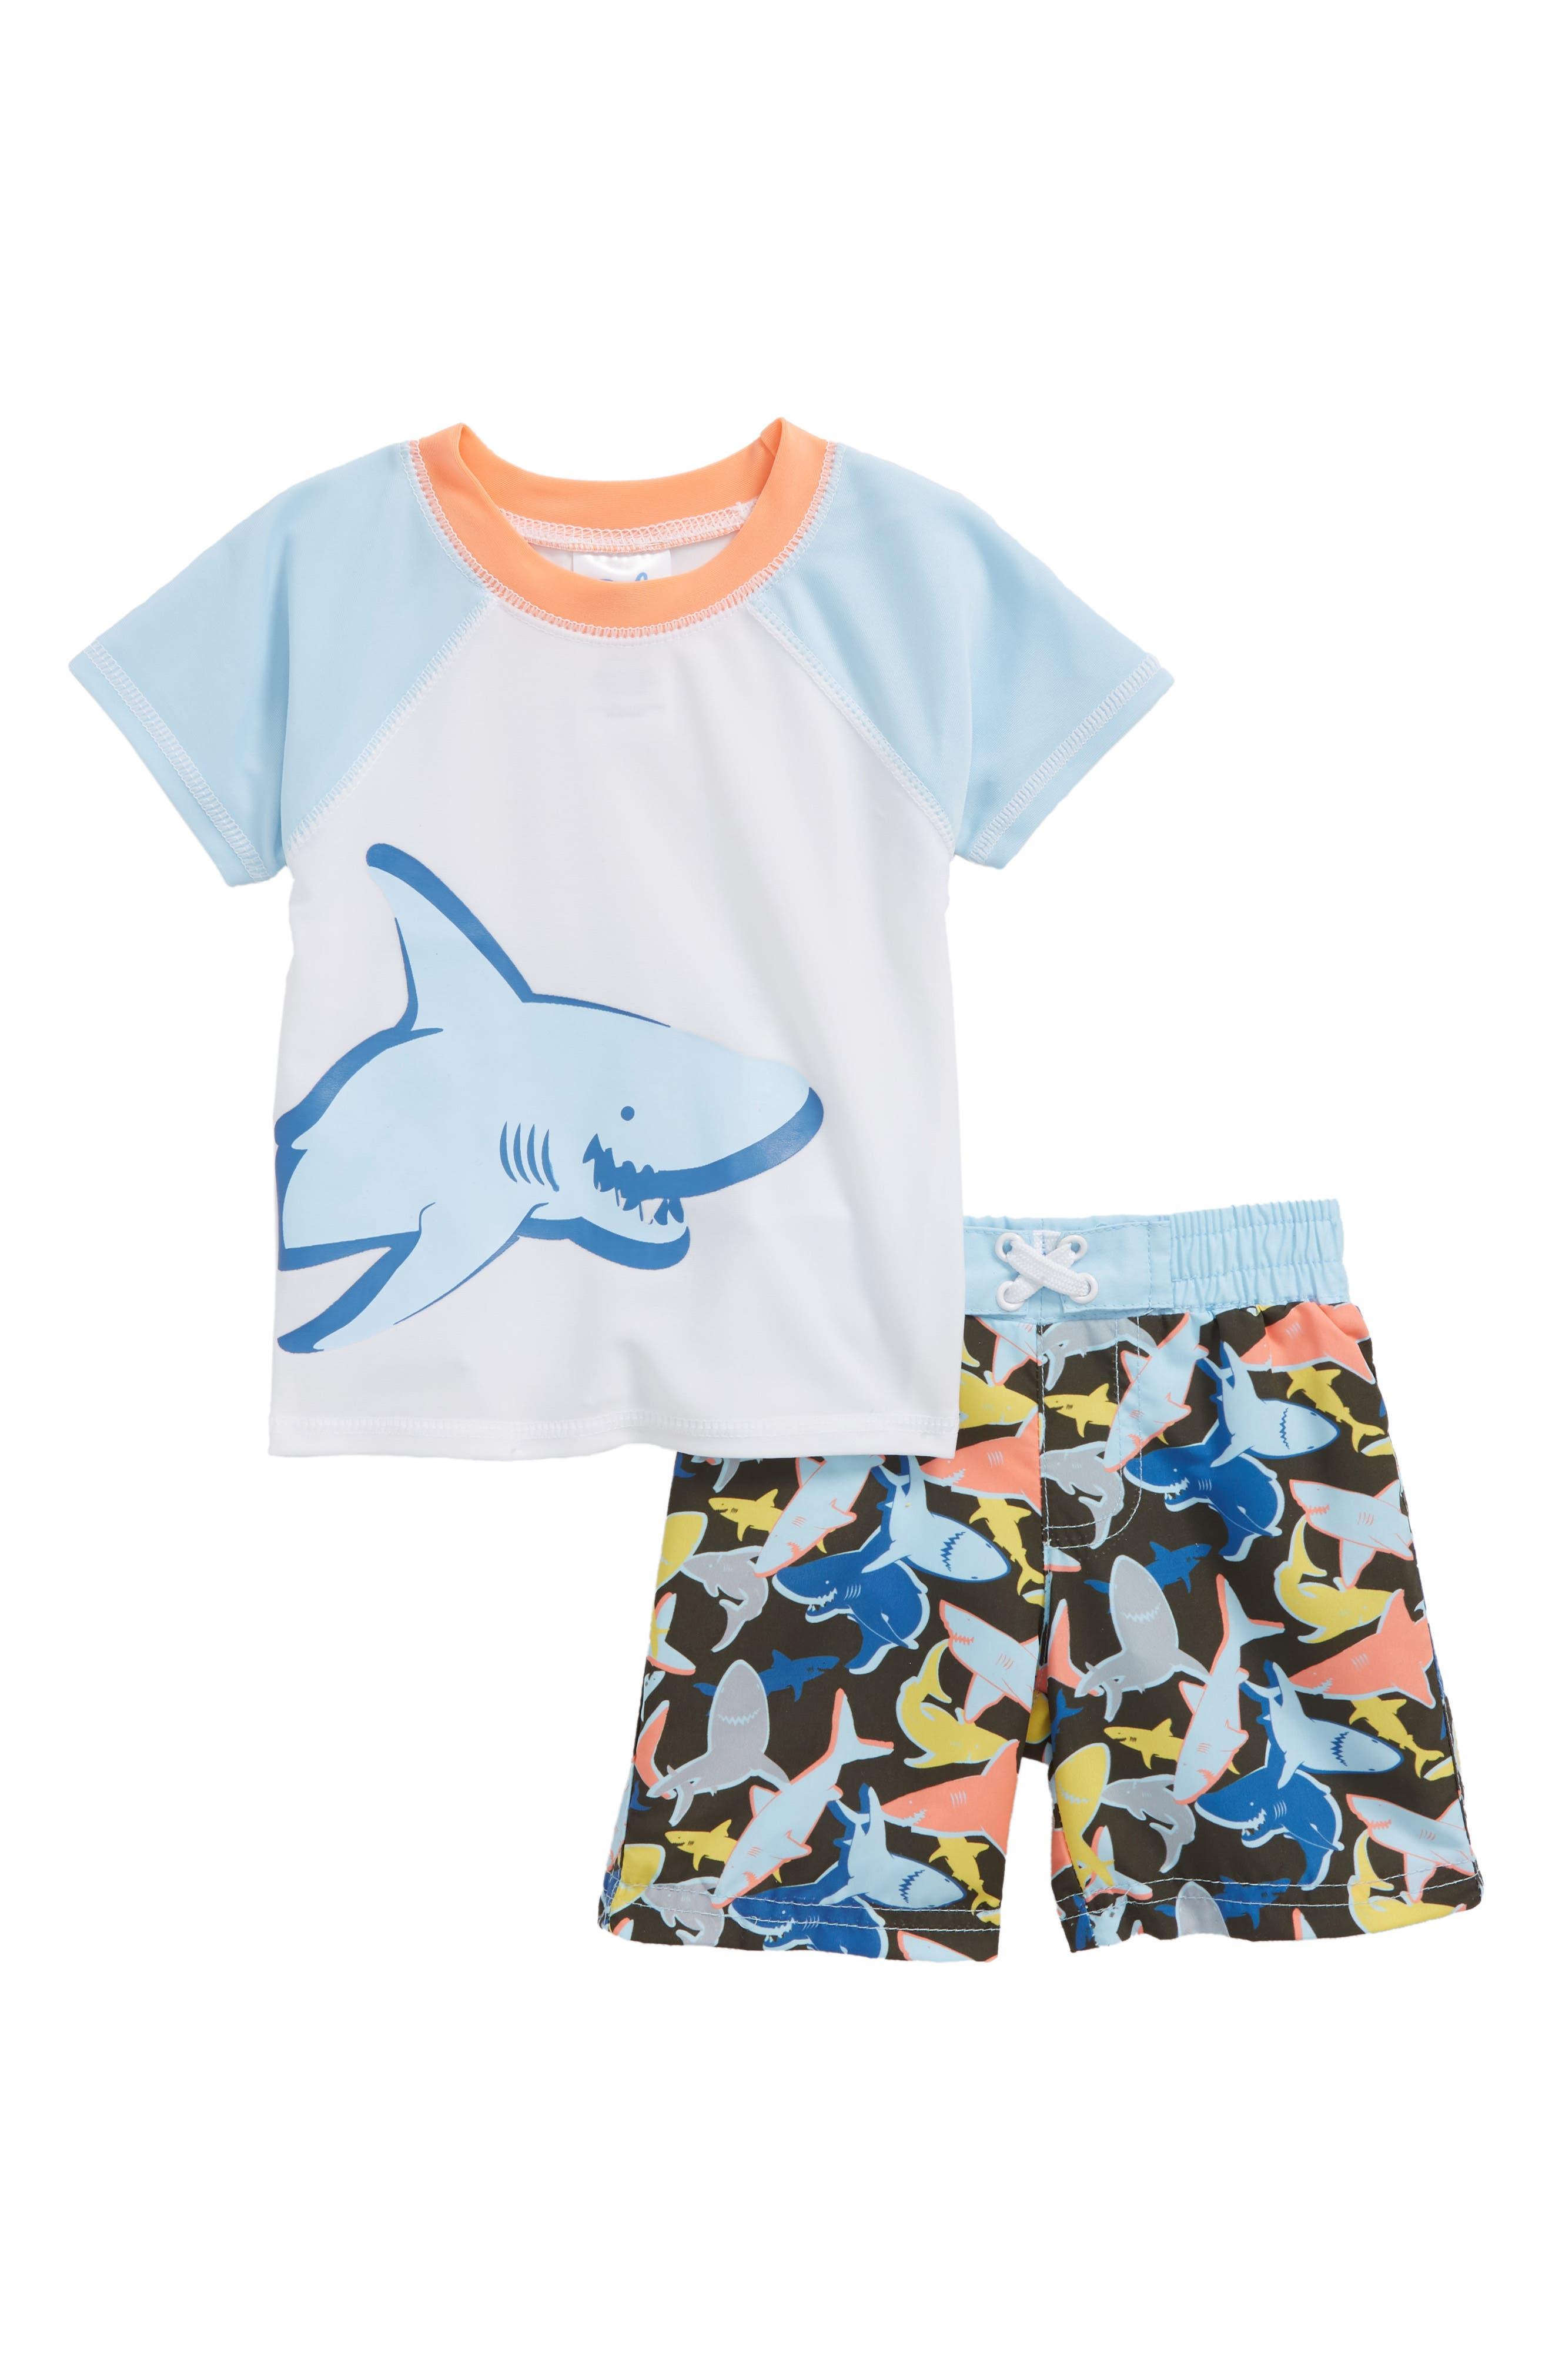 Friendly Shark Collison Two-Piece Rashguard Swimsuit,                         Main,                         color, White Multi